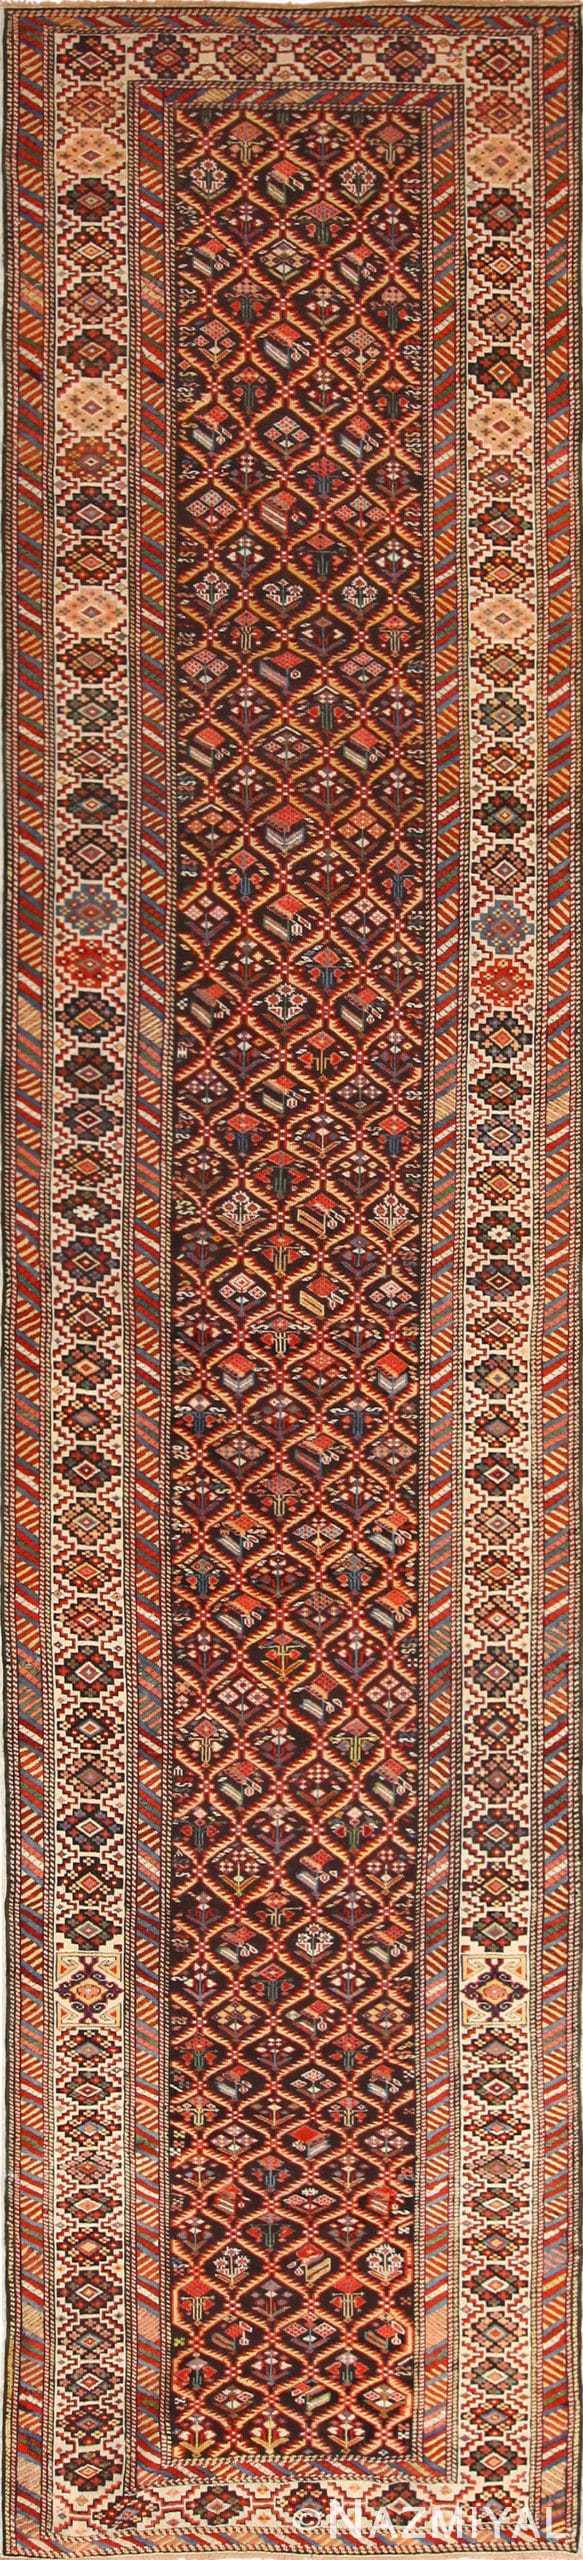 antique shirvan caucasian rug runner 49259 Nazmiyal